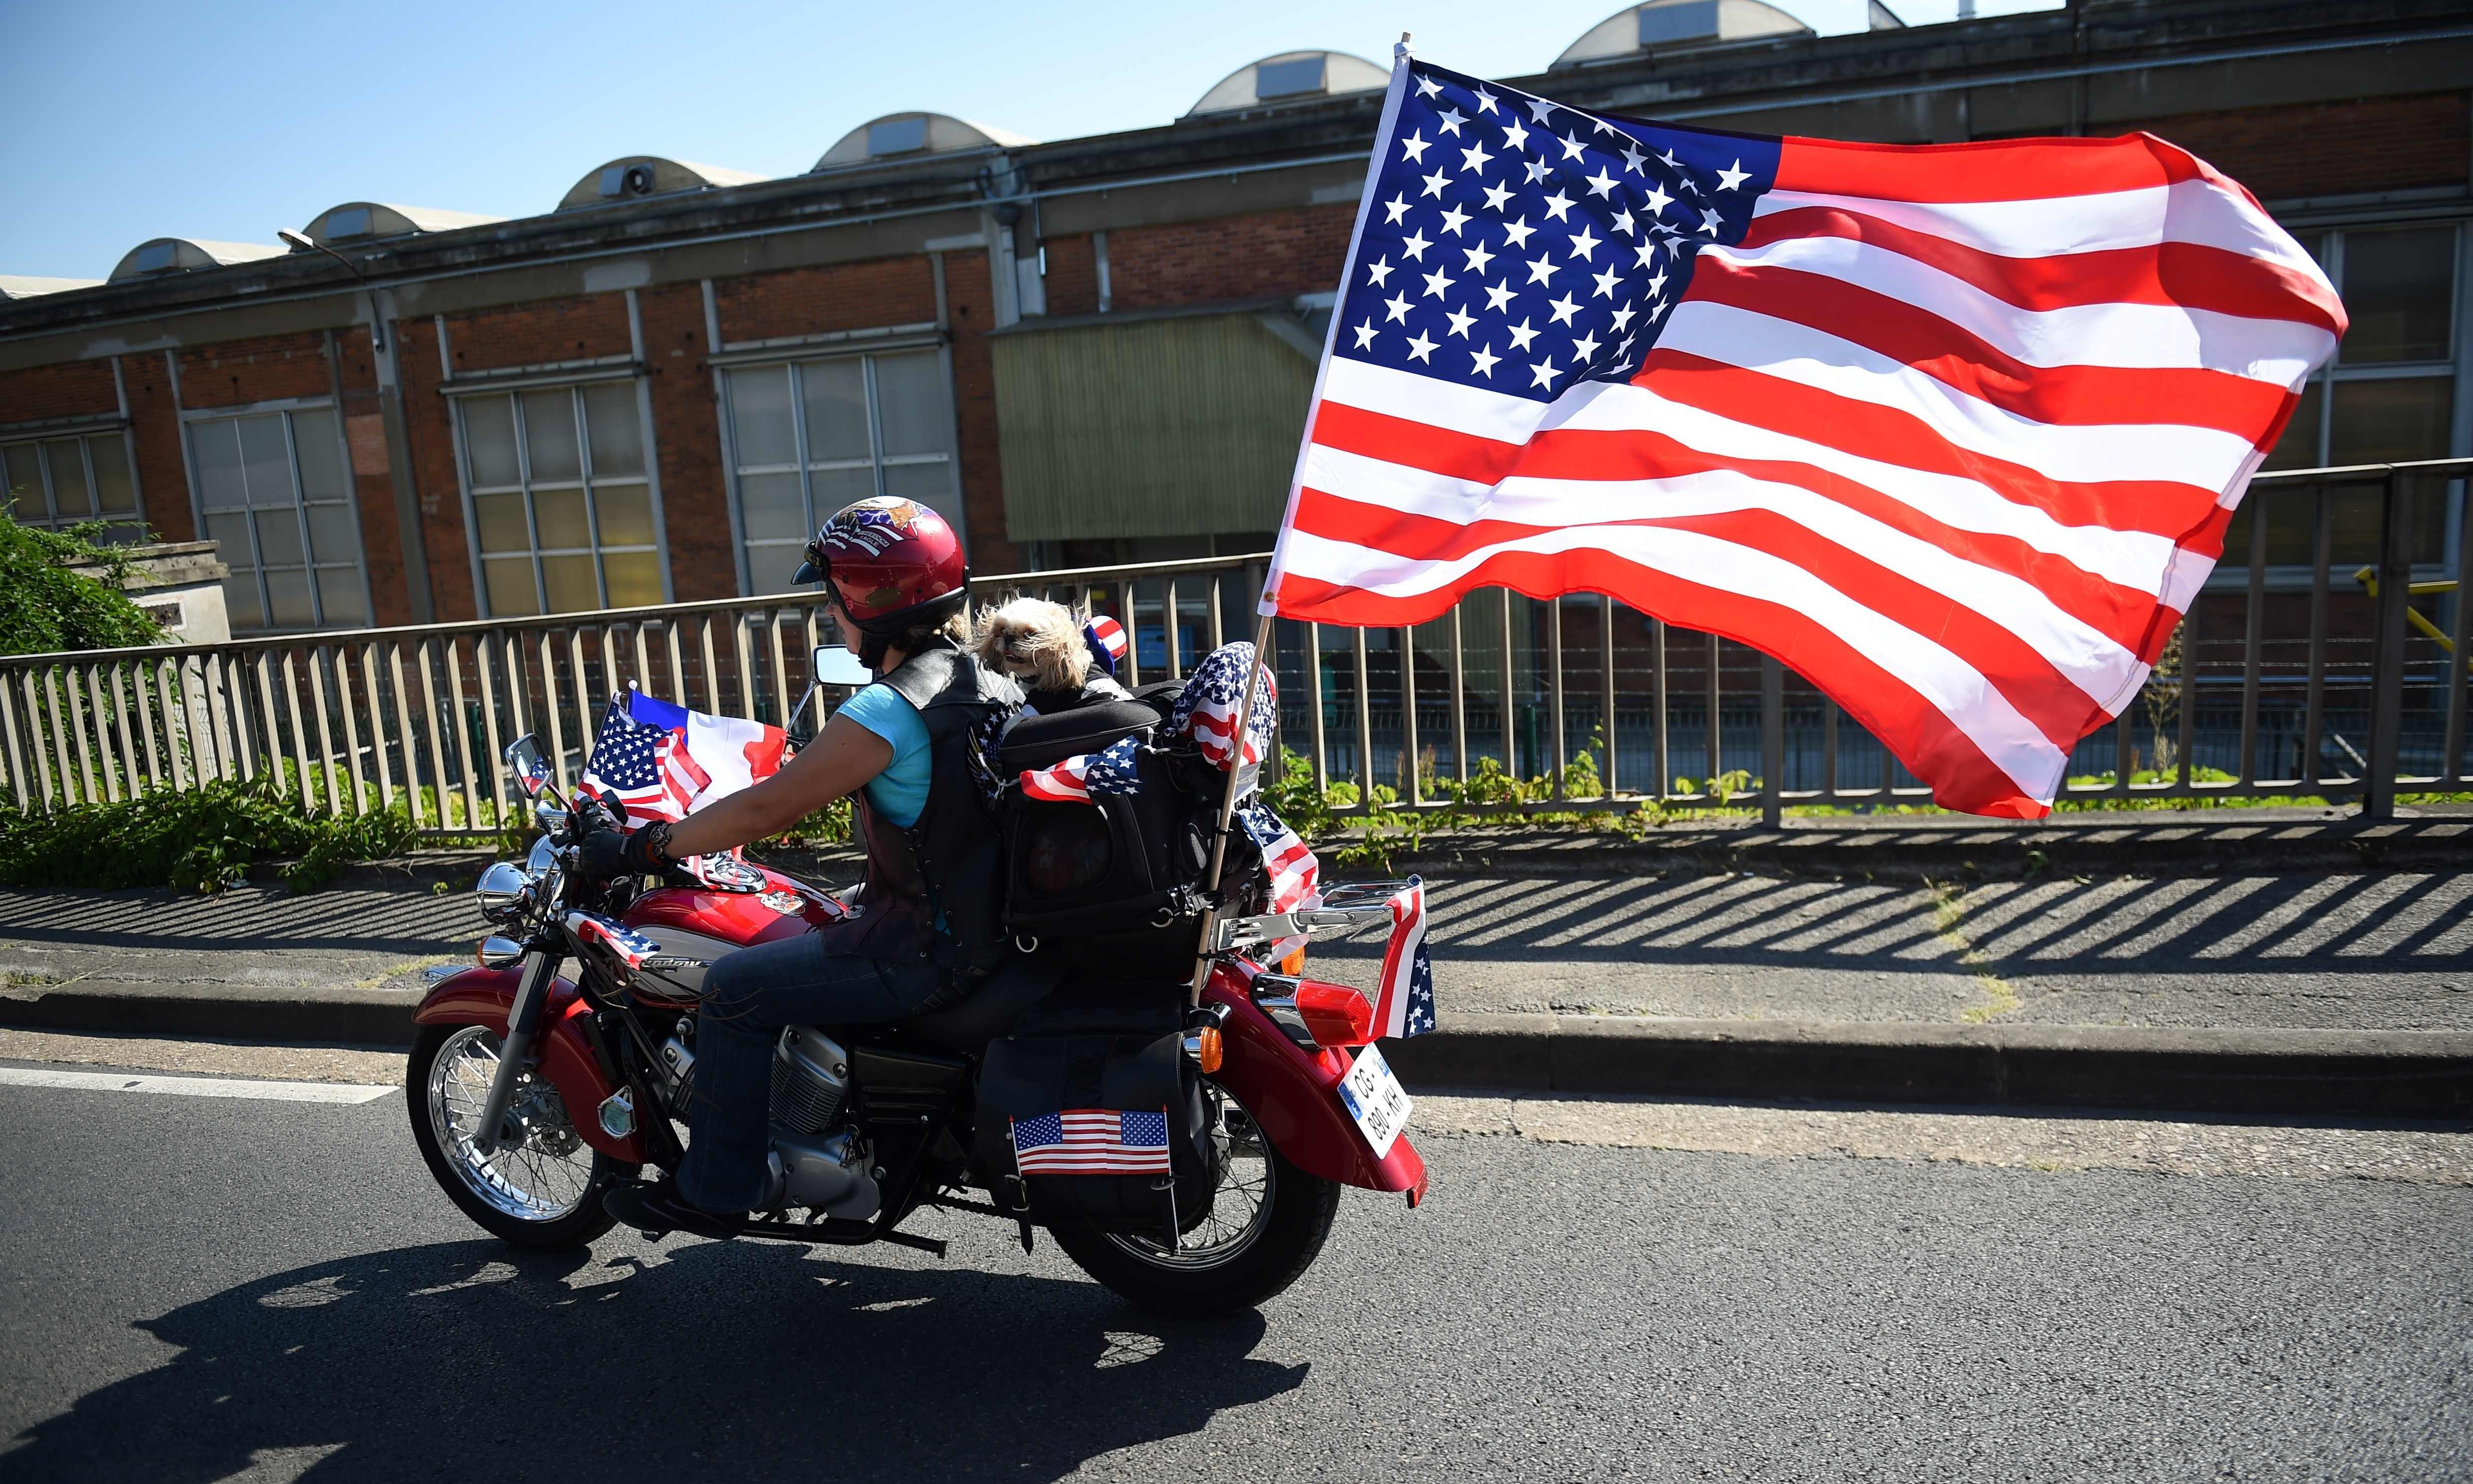 Trump makes U-turn to support Harley-Davidson as profits fall amid tariff war